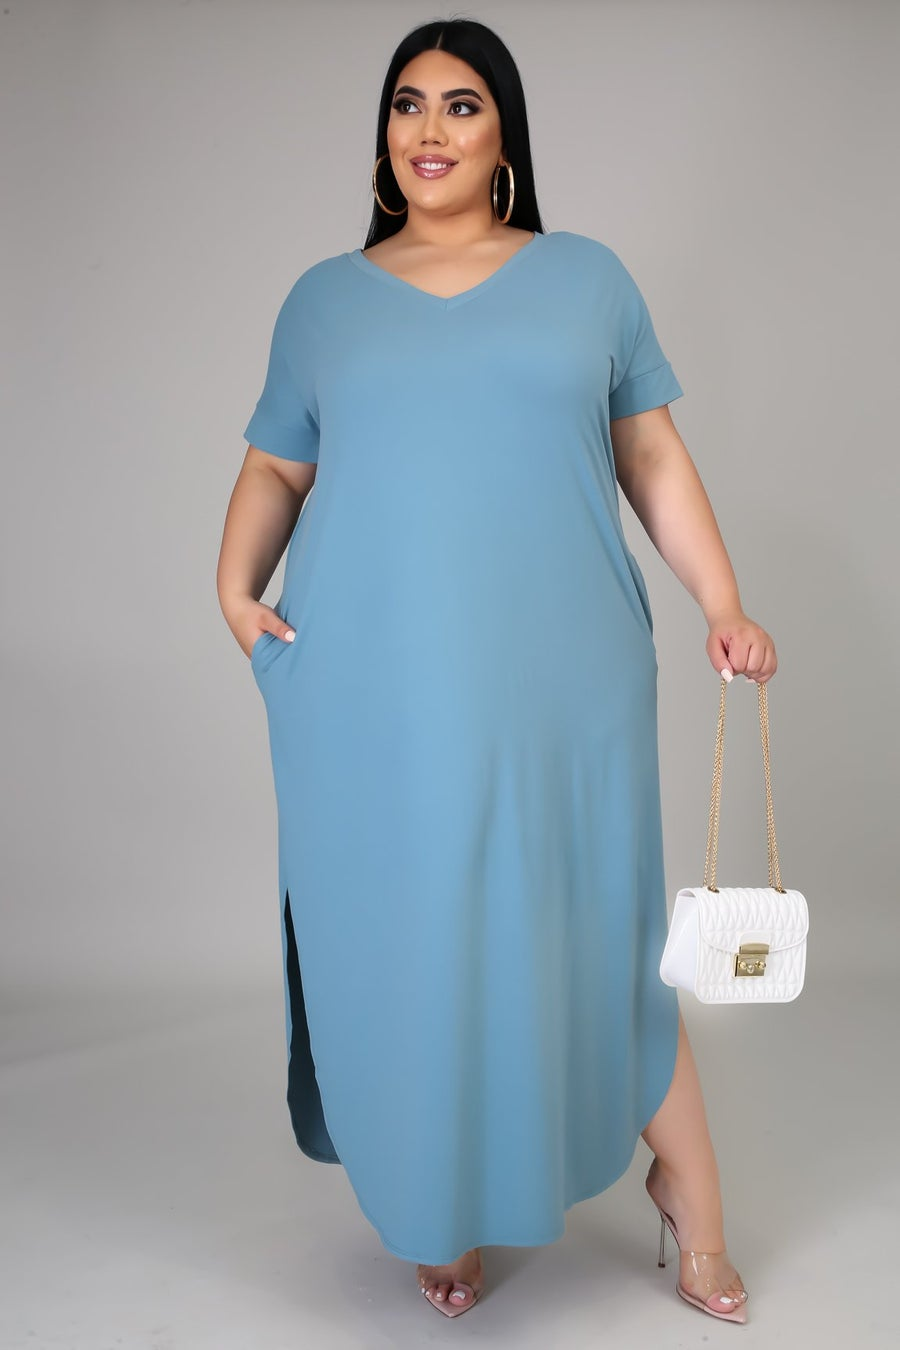 Image of T Dress